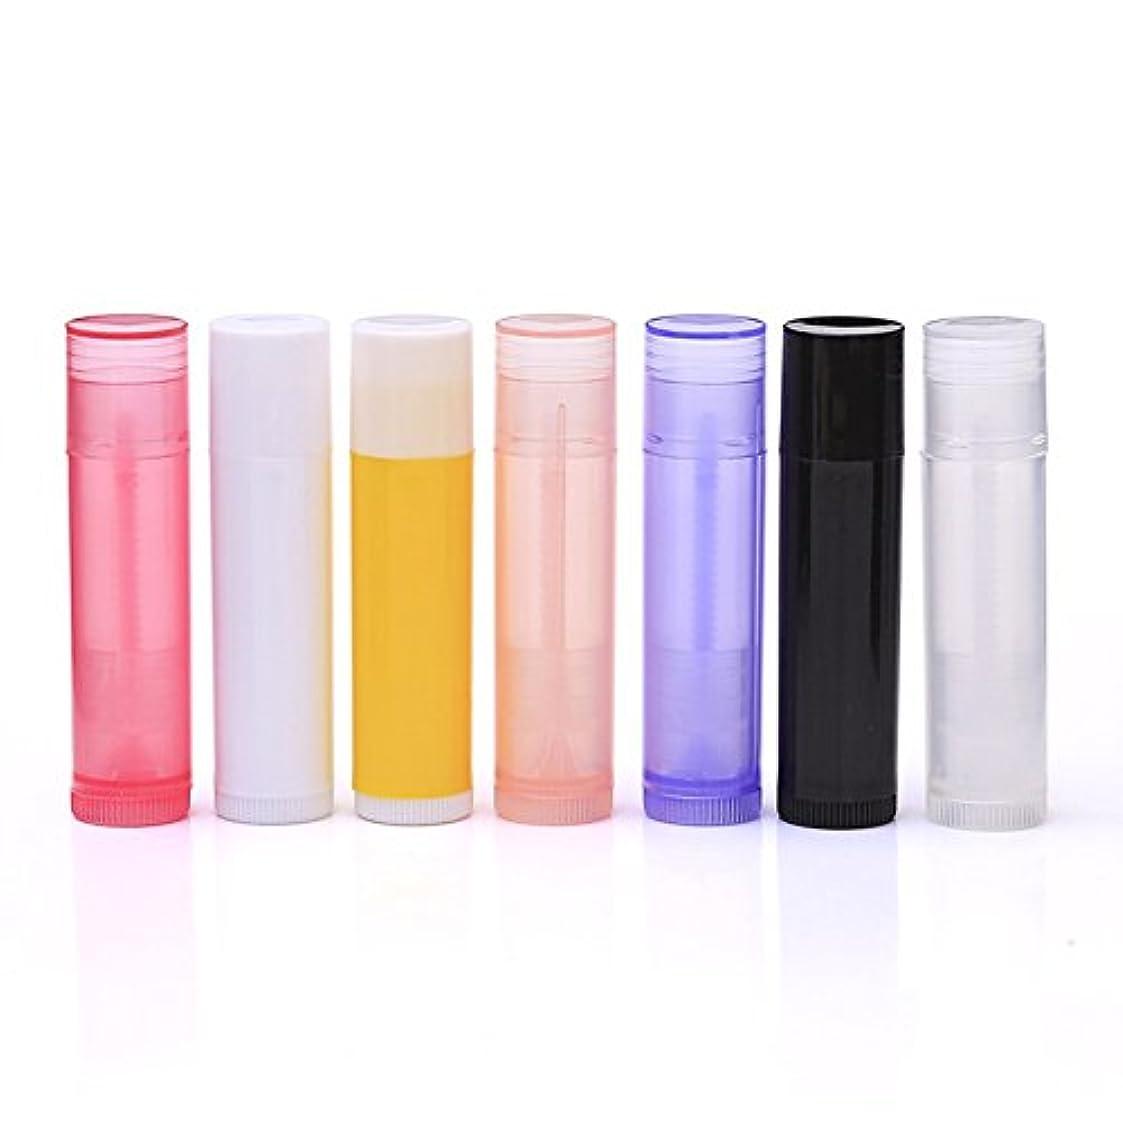 MeterMall  10個/セット5 ml DIYリップスティック真空ボトルリップスティックリップチューブリップスティックチューブ容器化粧品サンプル容器 Transparent